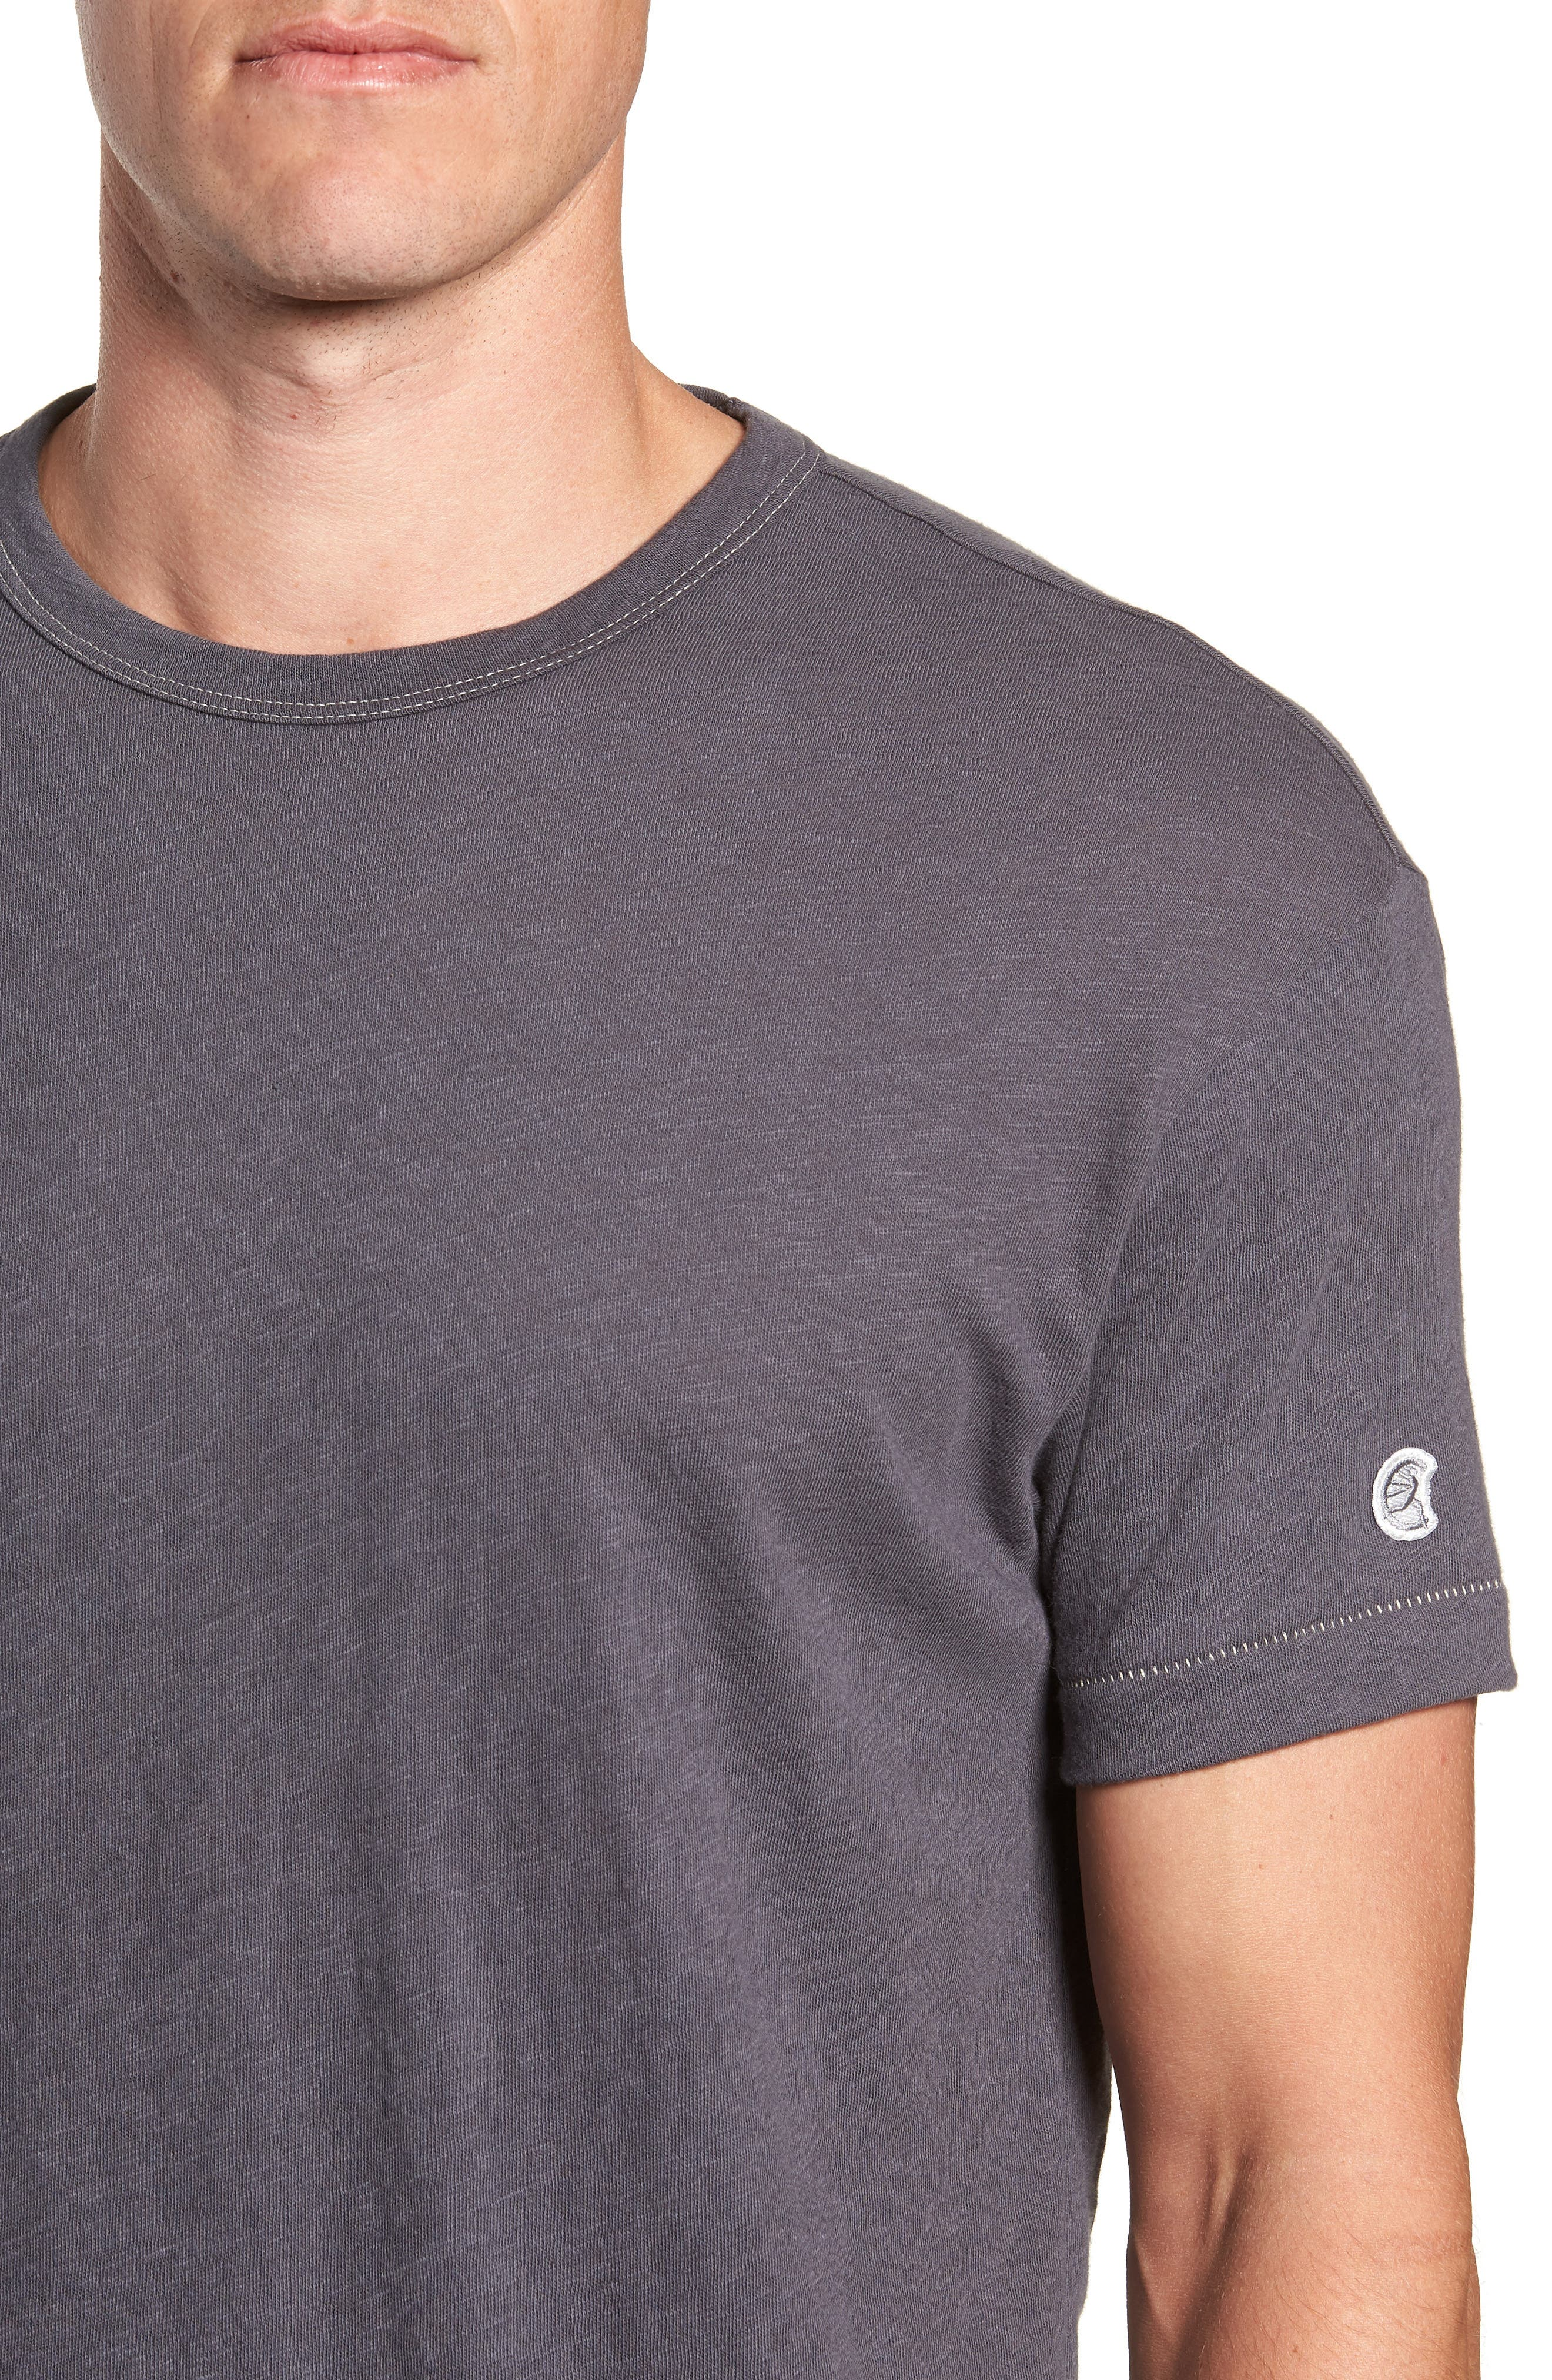 TODD SNYDER,                             + Champion Crewneck T-Shirt,                             Alternate thumbnail 4, color,                             060